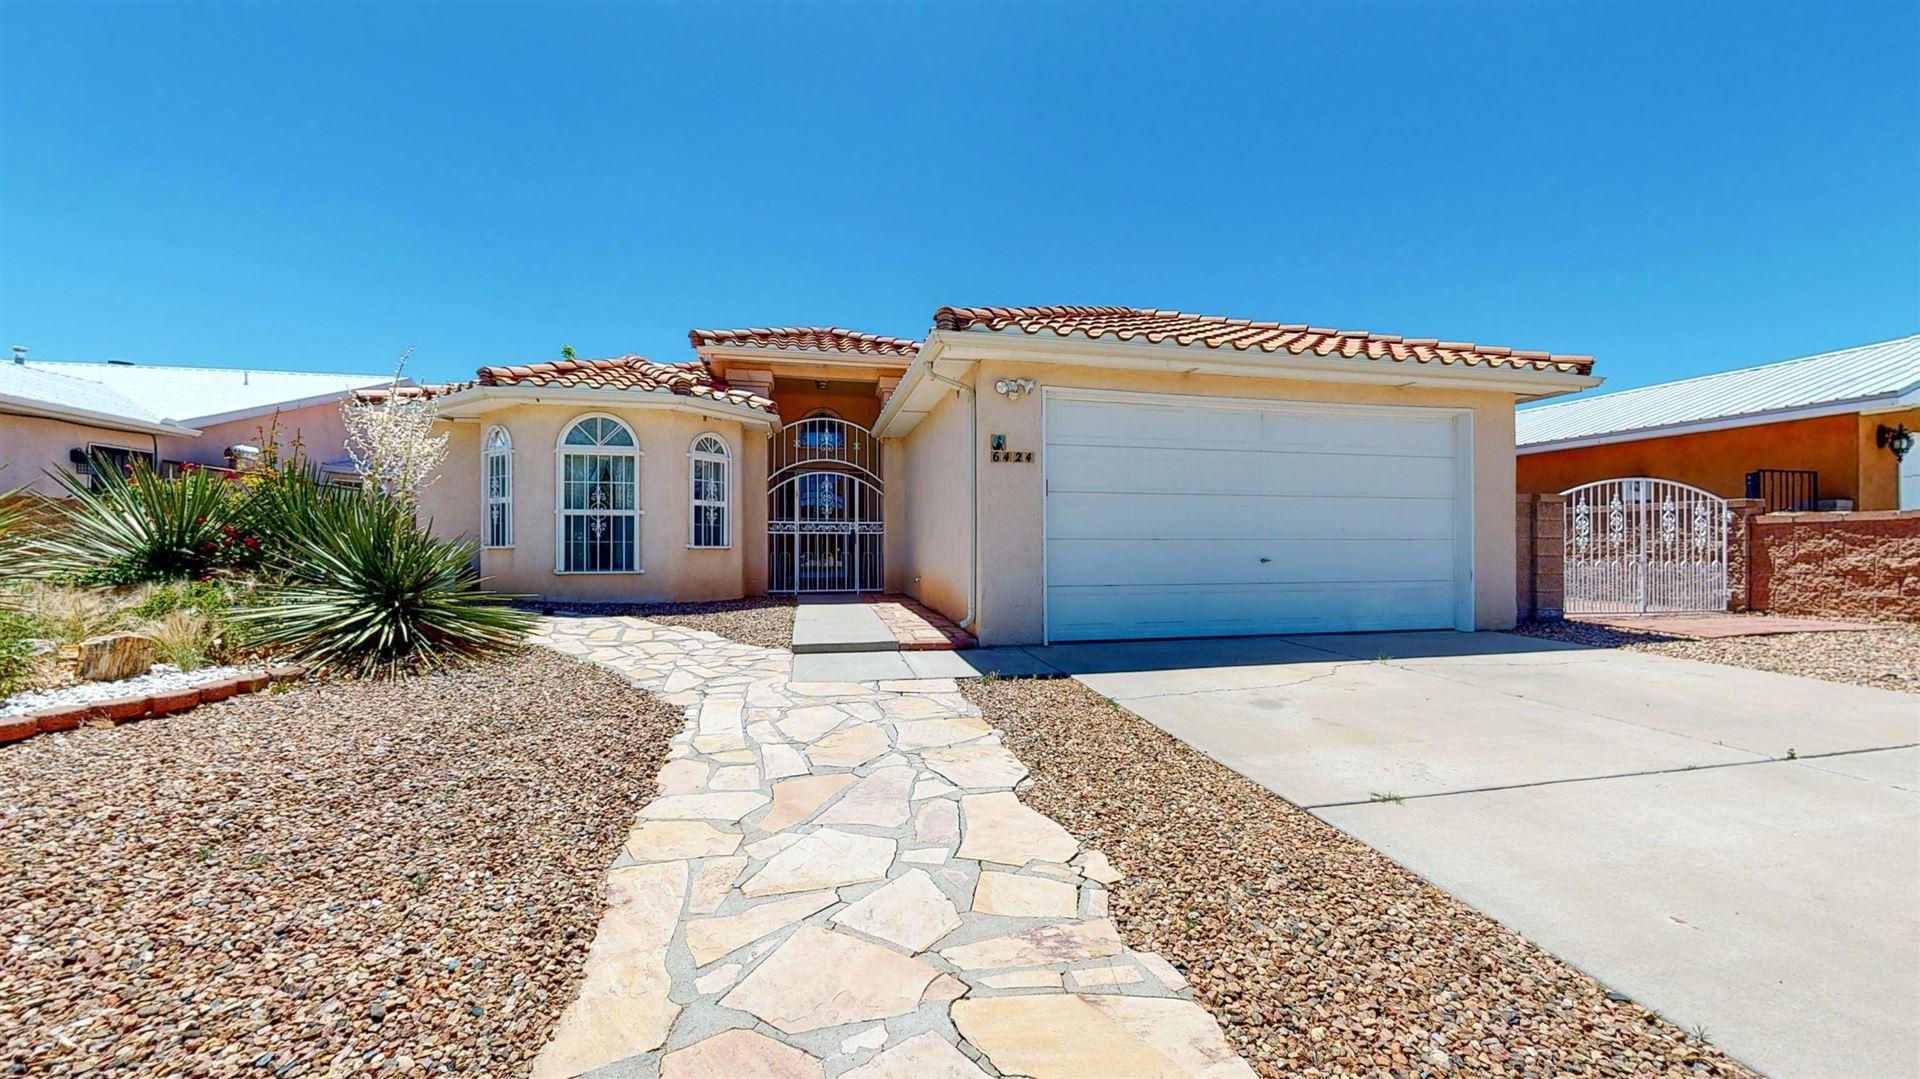 6424 Mojave Street NW, Albuquerque, NM 87120 - #: 968987